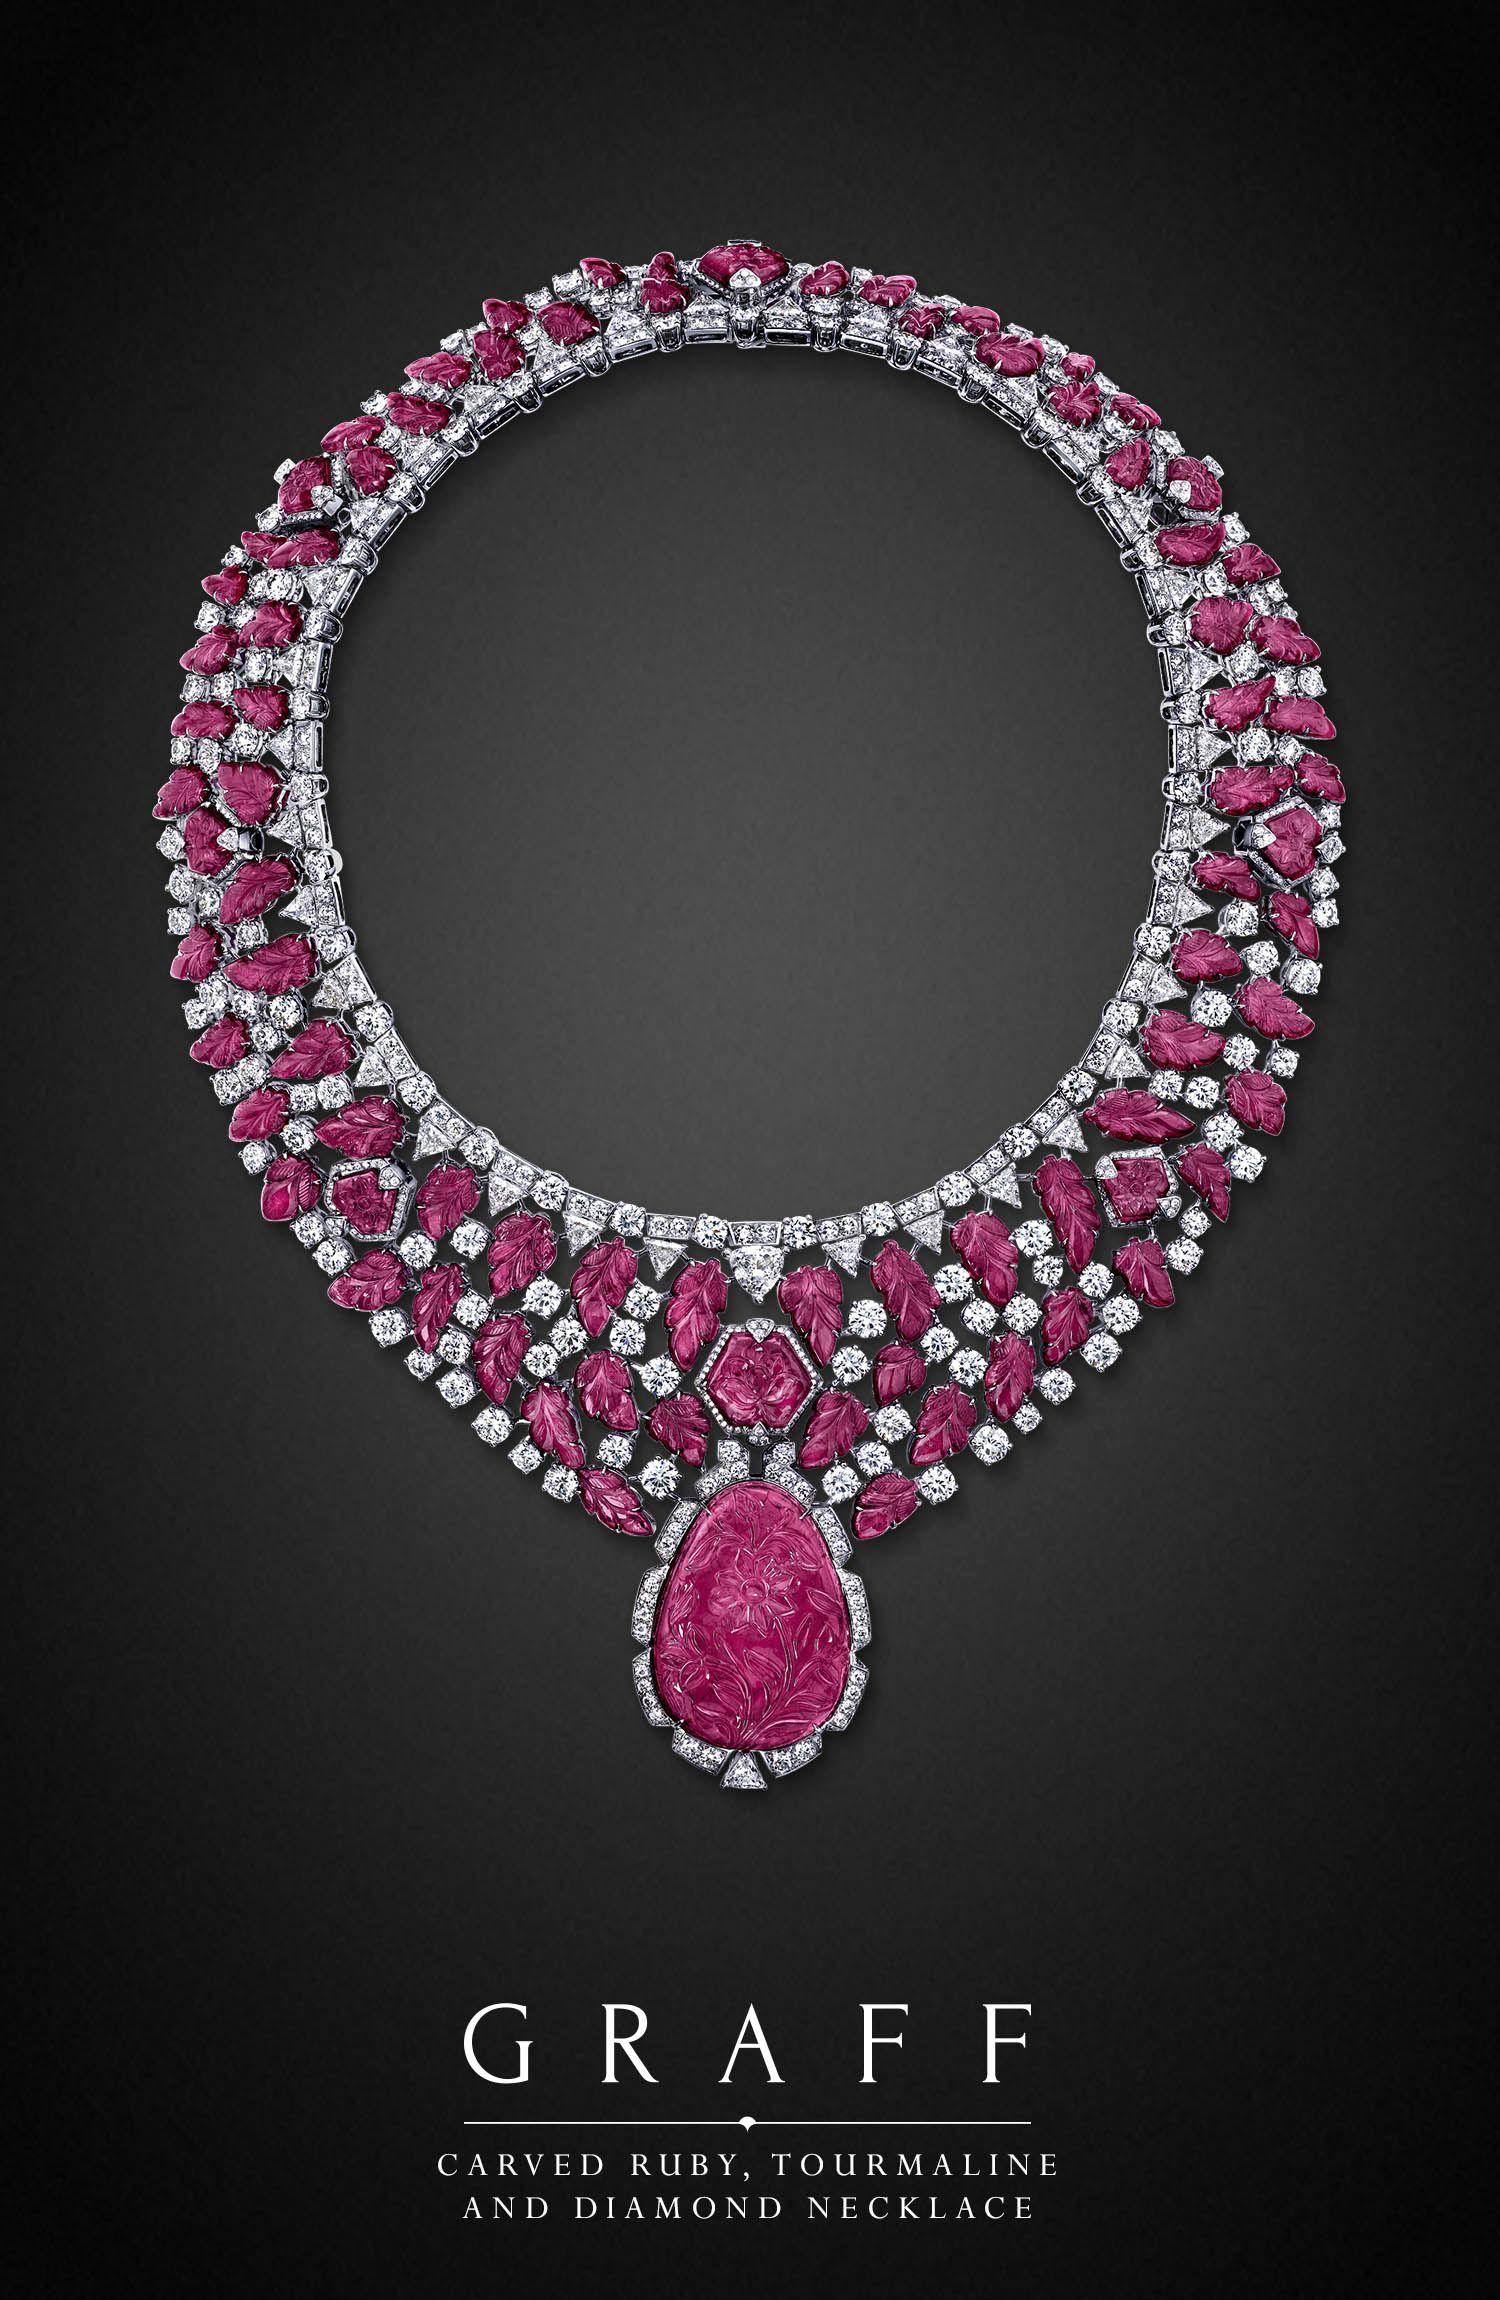 Graff Diamonds: Carved Ruby, Tourmaline and Diamond ...